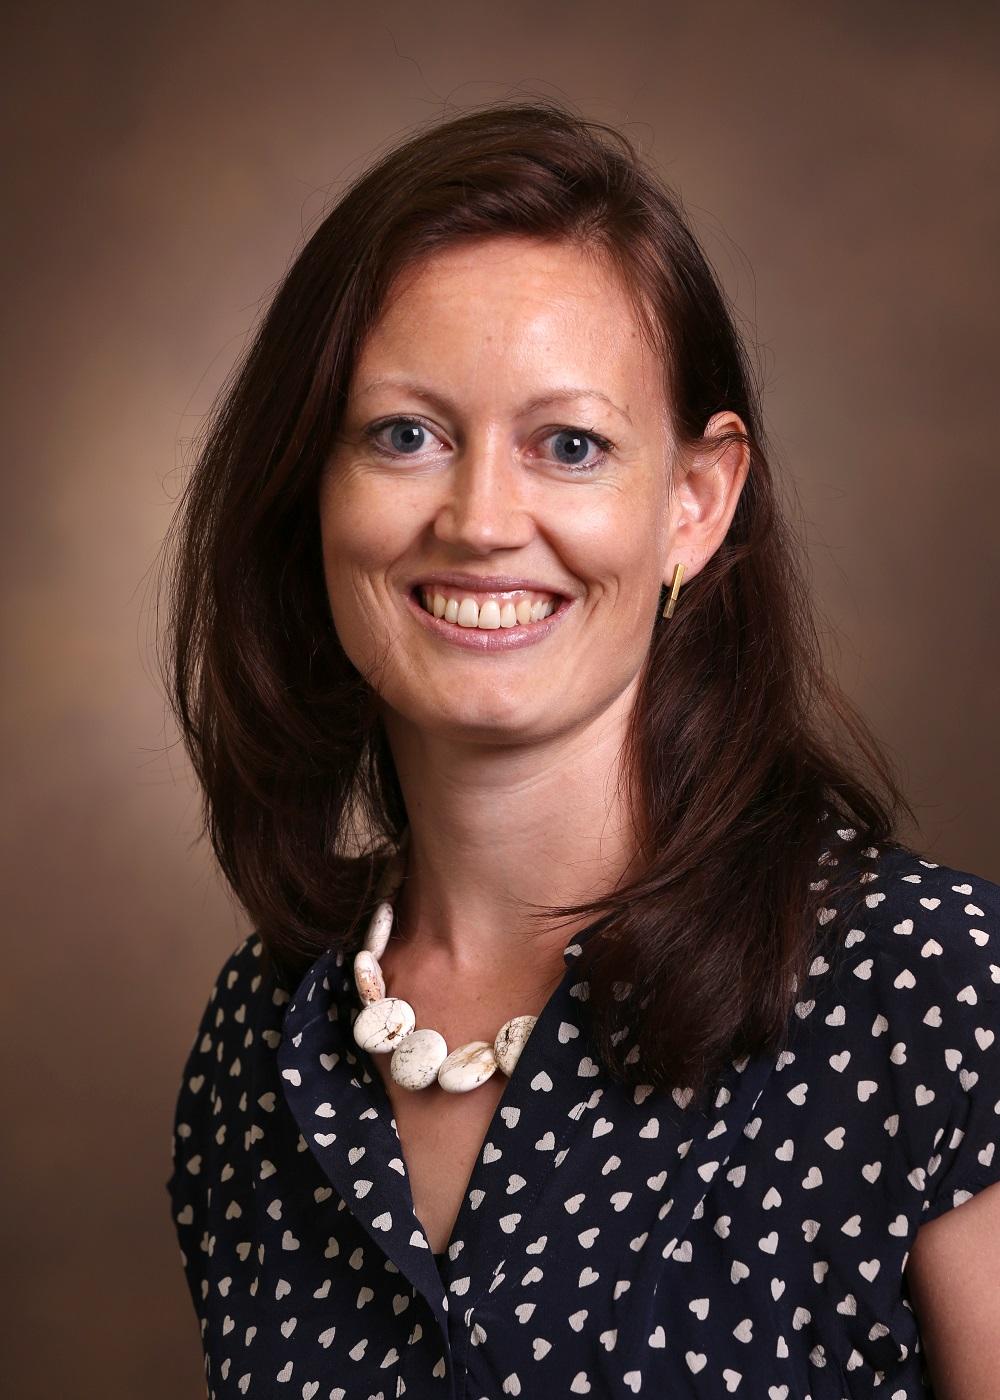 Nelleke C. van Wouwe, Ph.D., M.Sc., joins UofL research faculty